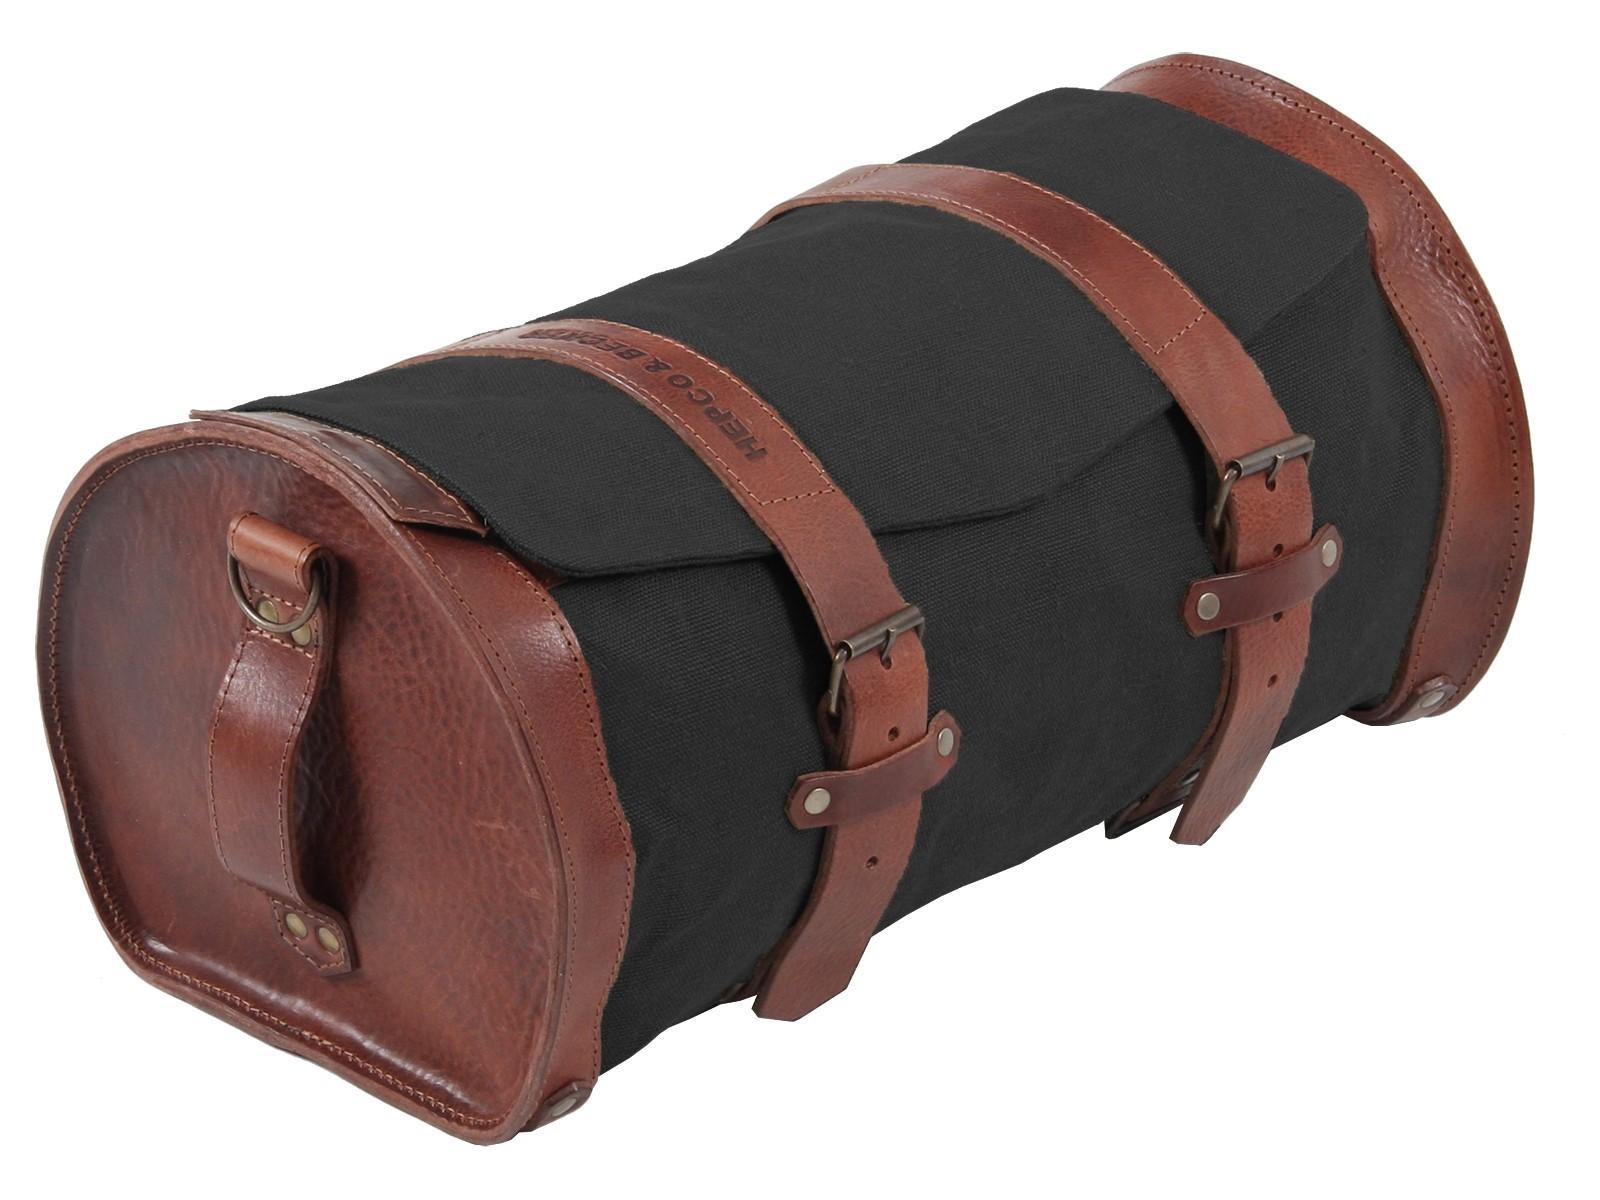 Hepco & Becker Legacy Rear Bag 28 ltr - Black